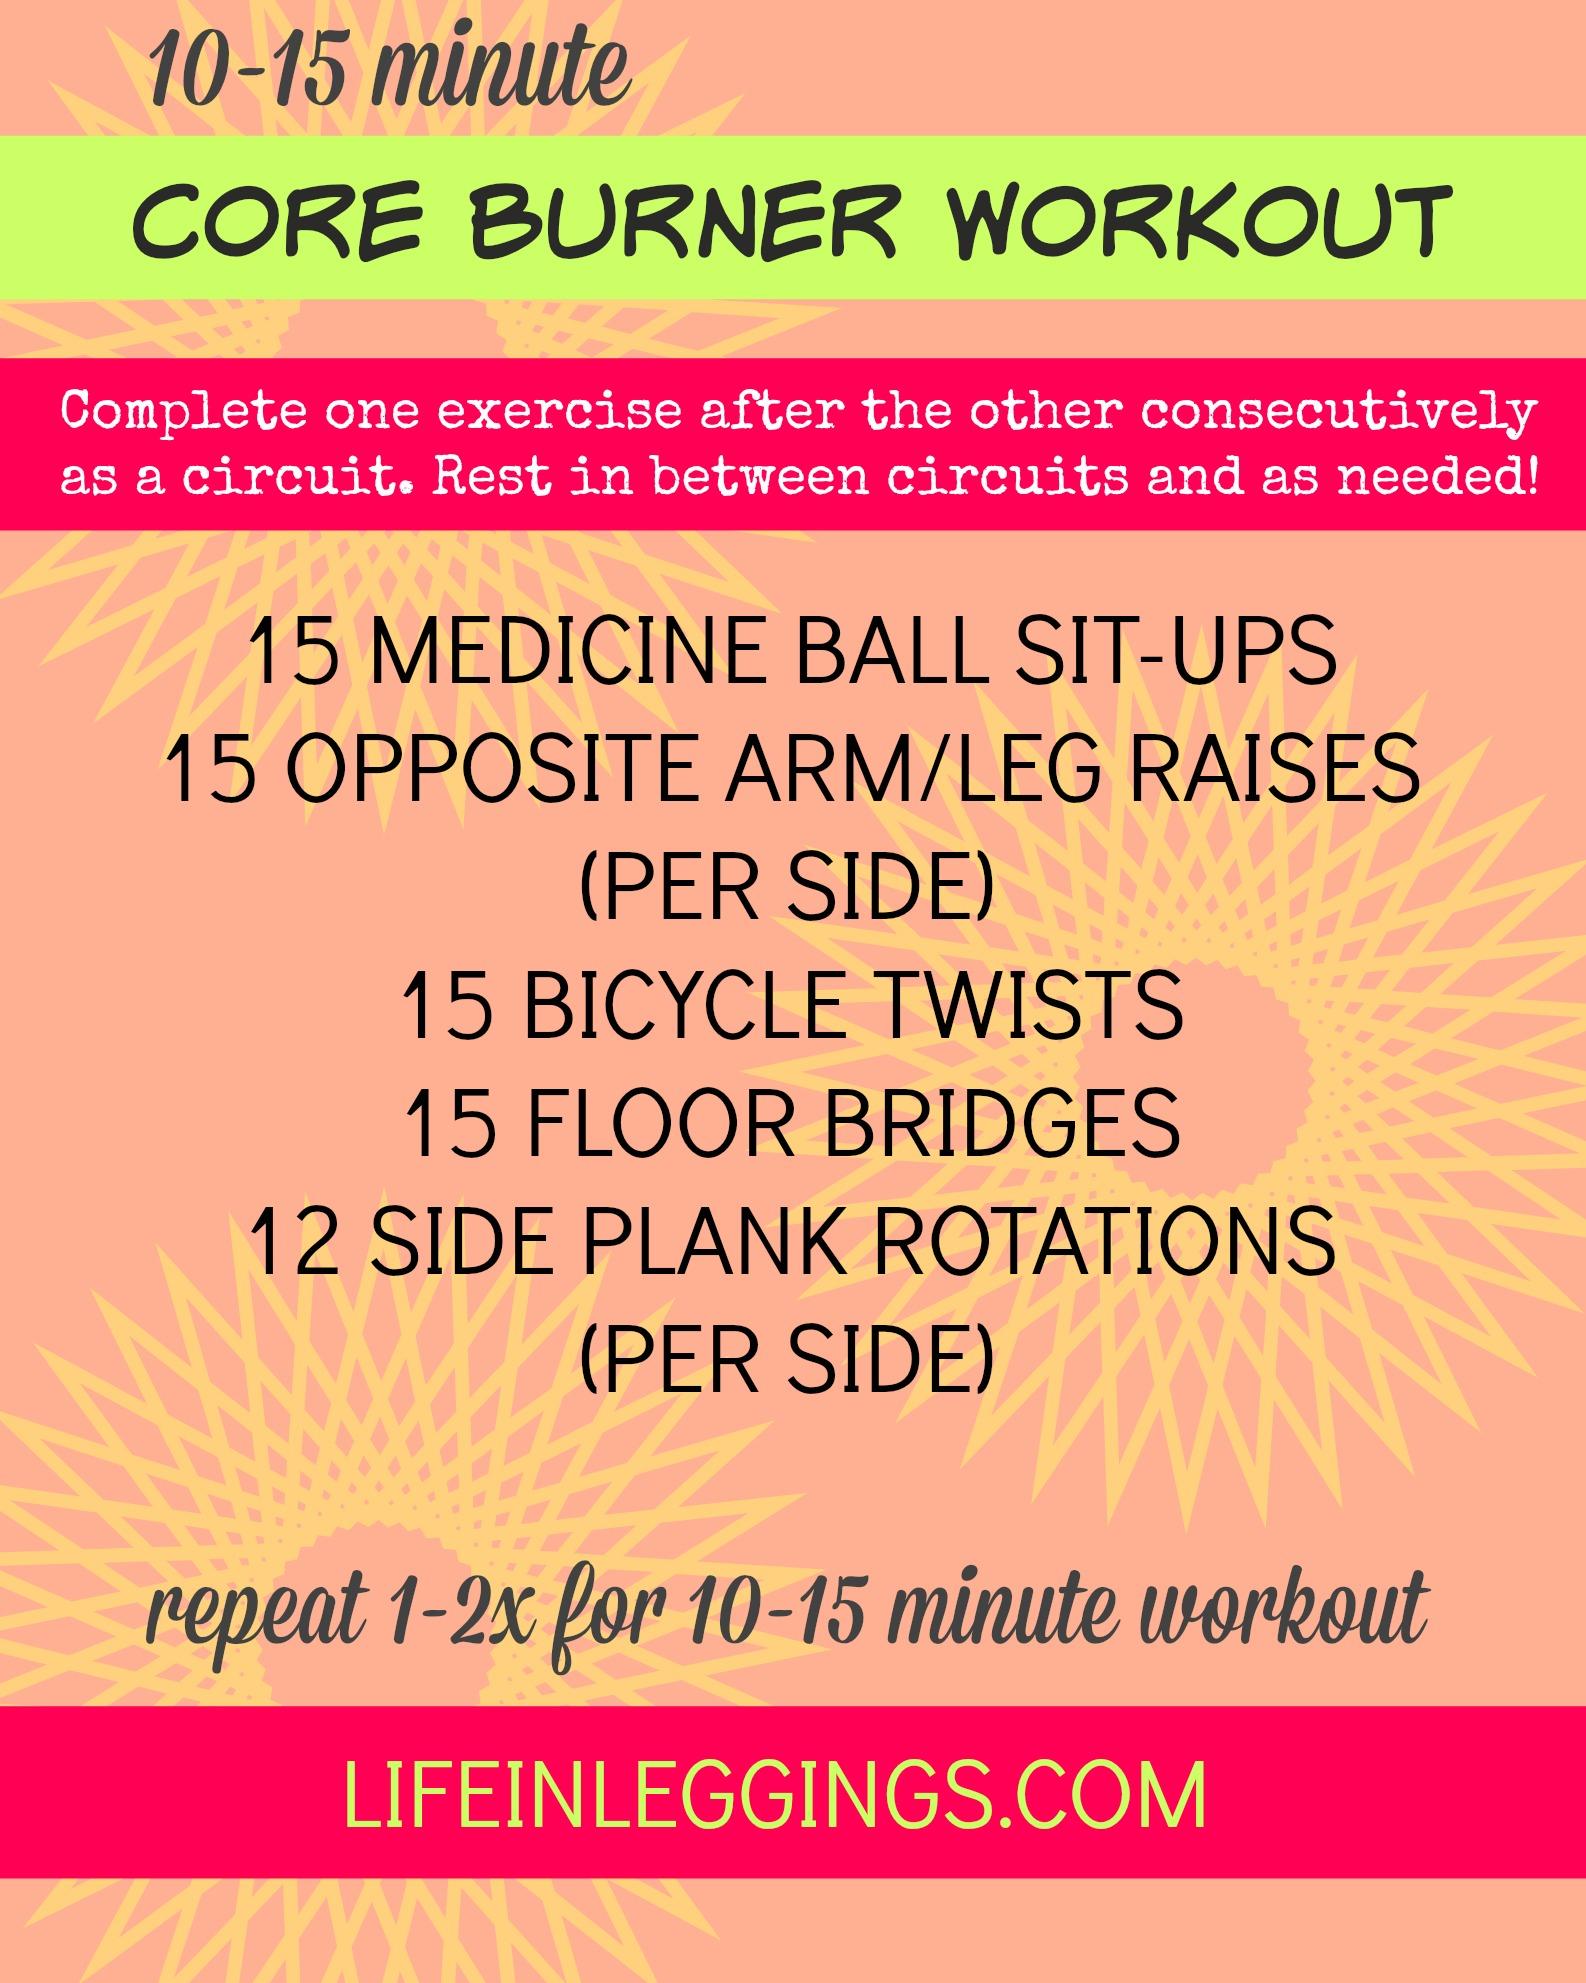 10-15 minute core burner workout